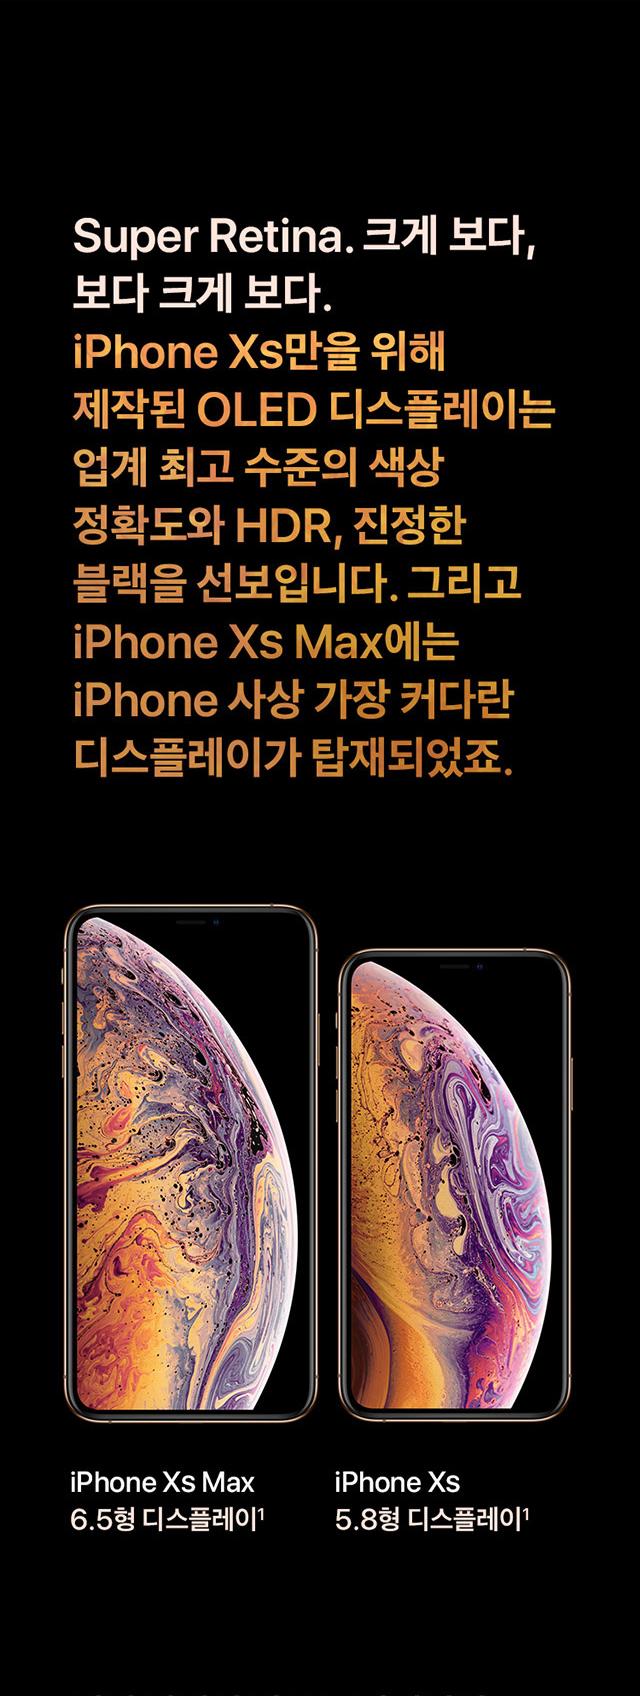 Super Retina. 크게 보다, 보다 크게 보다. iPhone Xs만을 위해 제작된 OLED디스플레이는 업계 최고 수준의 색상 정확도와 HDR, 진정한 블랙을 선보입니다. 그리고 iPhone Xs Max에는 iPhone 사상 가장 커다란 디스플레이가 탑재되었죠. iPhone Xs Max 6.5형 디스플레이, iPhone Xs 5.8형 디스플레이